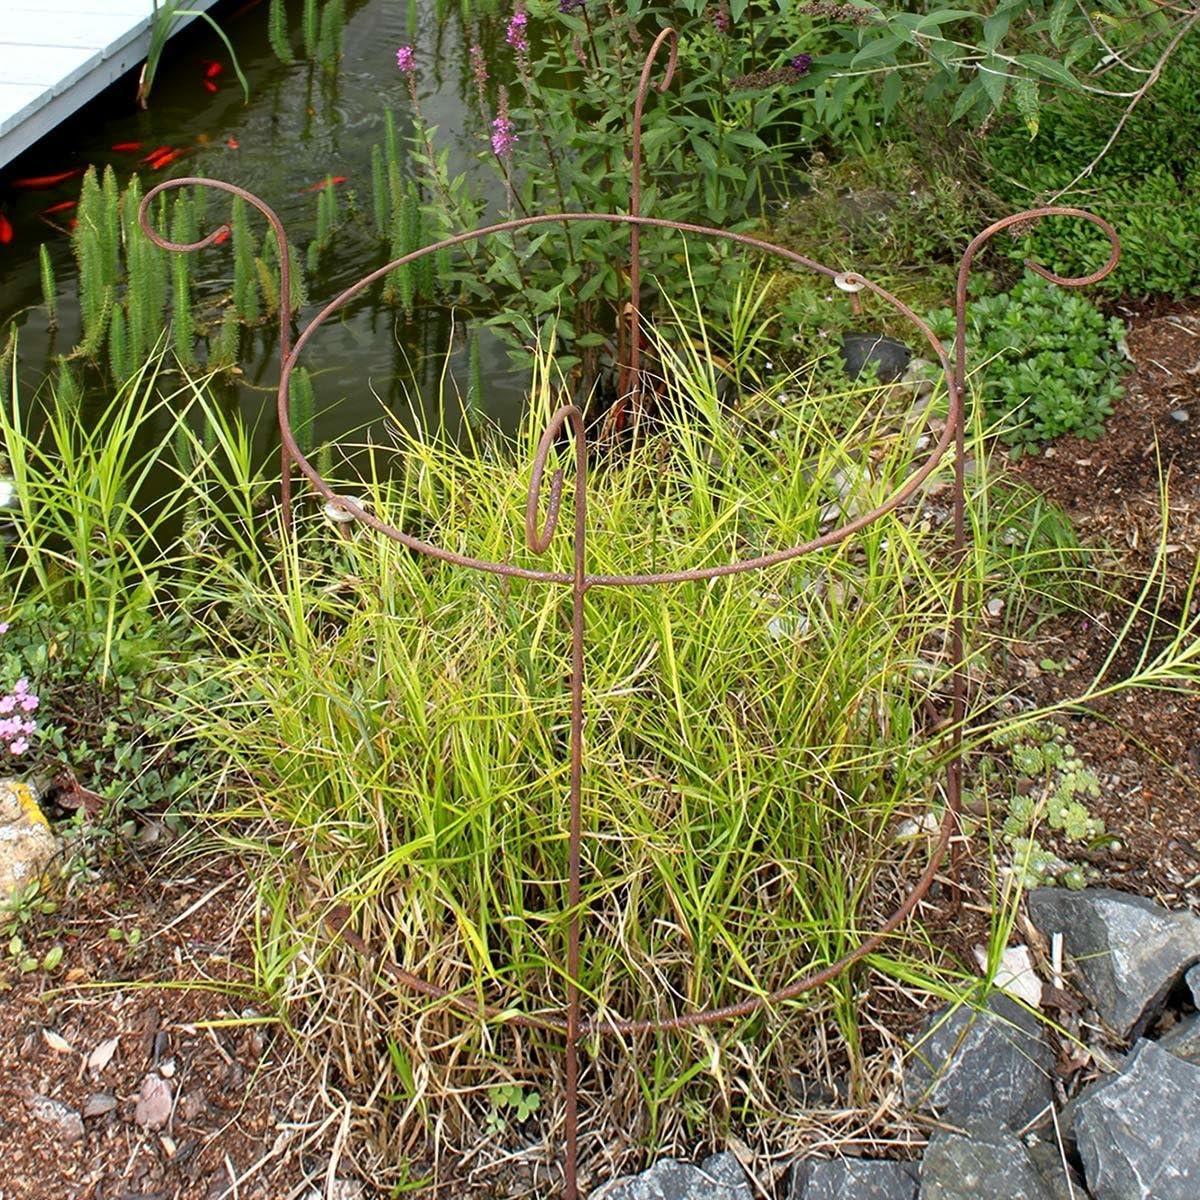 tomgarten Staudenhalter Rondo Stabiler Metall Staudenhalter mit Naturrost Patina Idealer Blumenhalter 78 x 43 cm groß